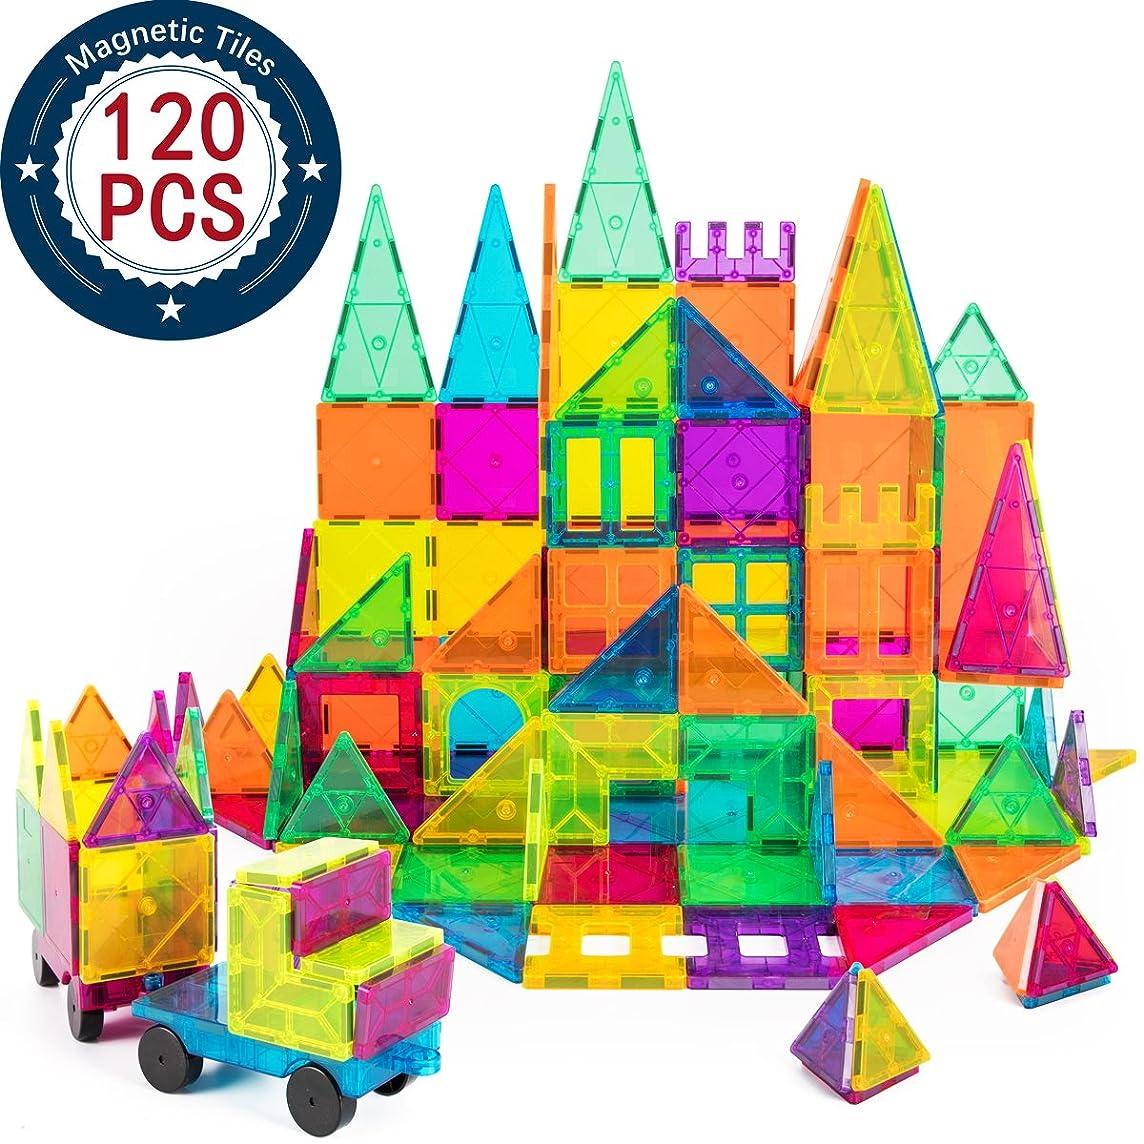 Kids Magnet Toys Magnet Building Tiles, 120 PCs 3D Magnetic Building Blocks Set, Educational Toys for Kids Children